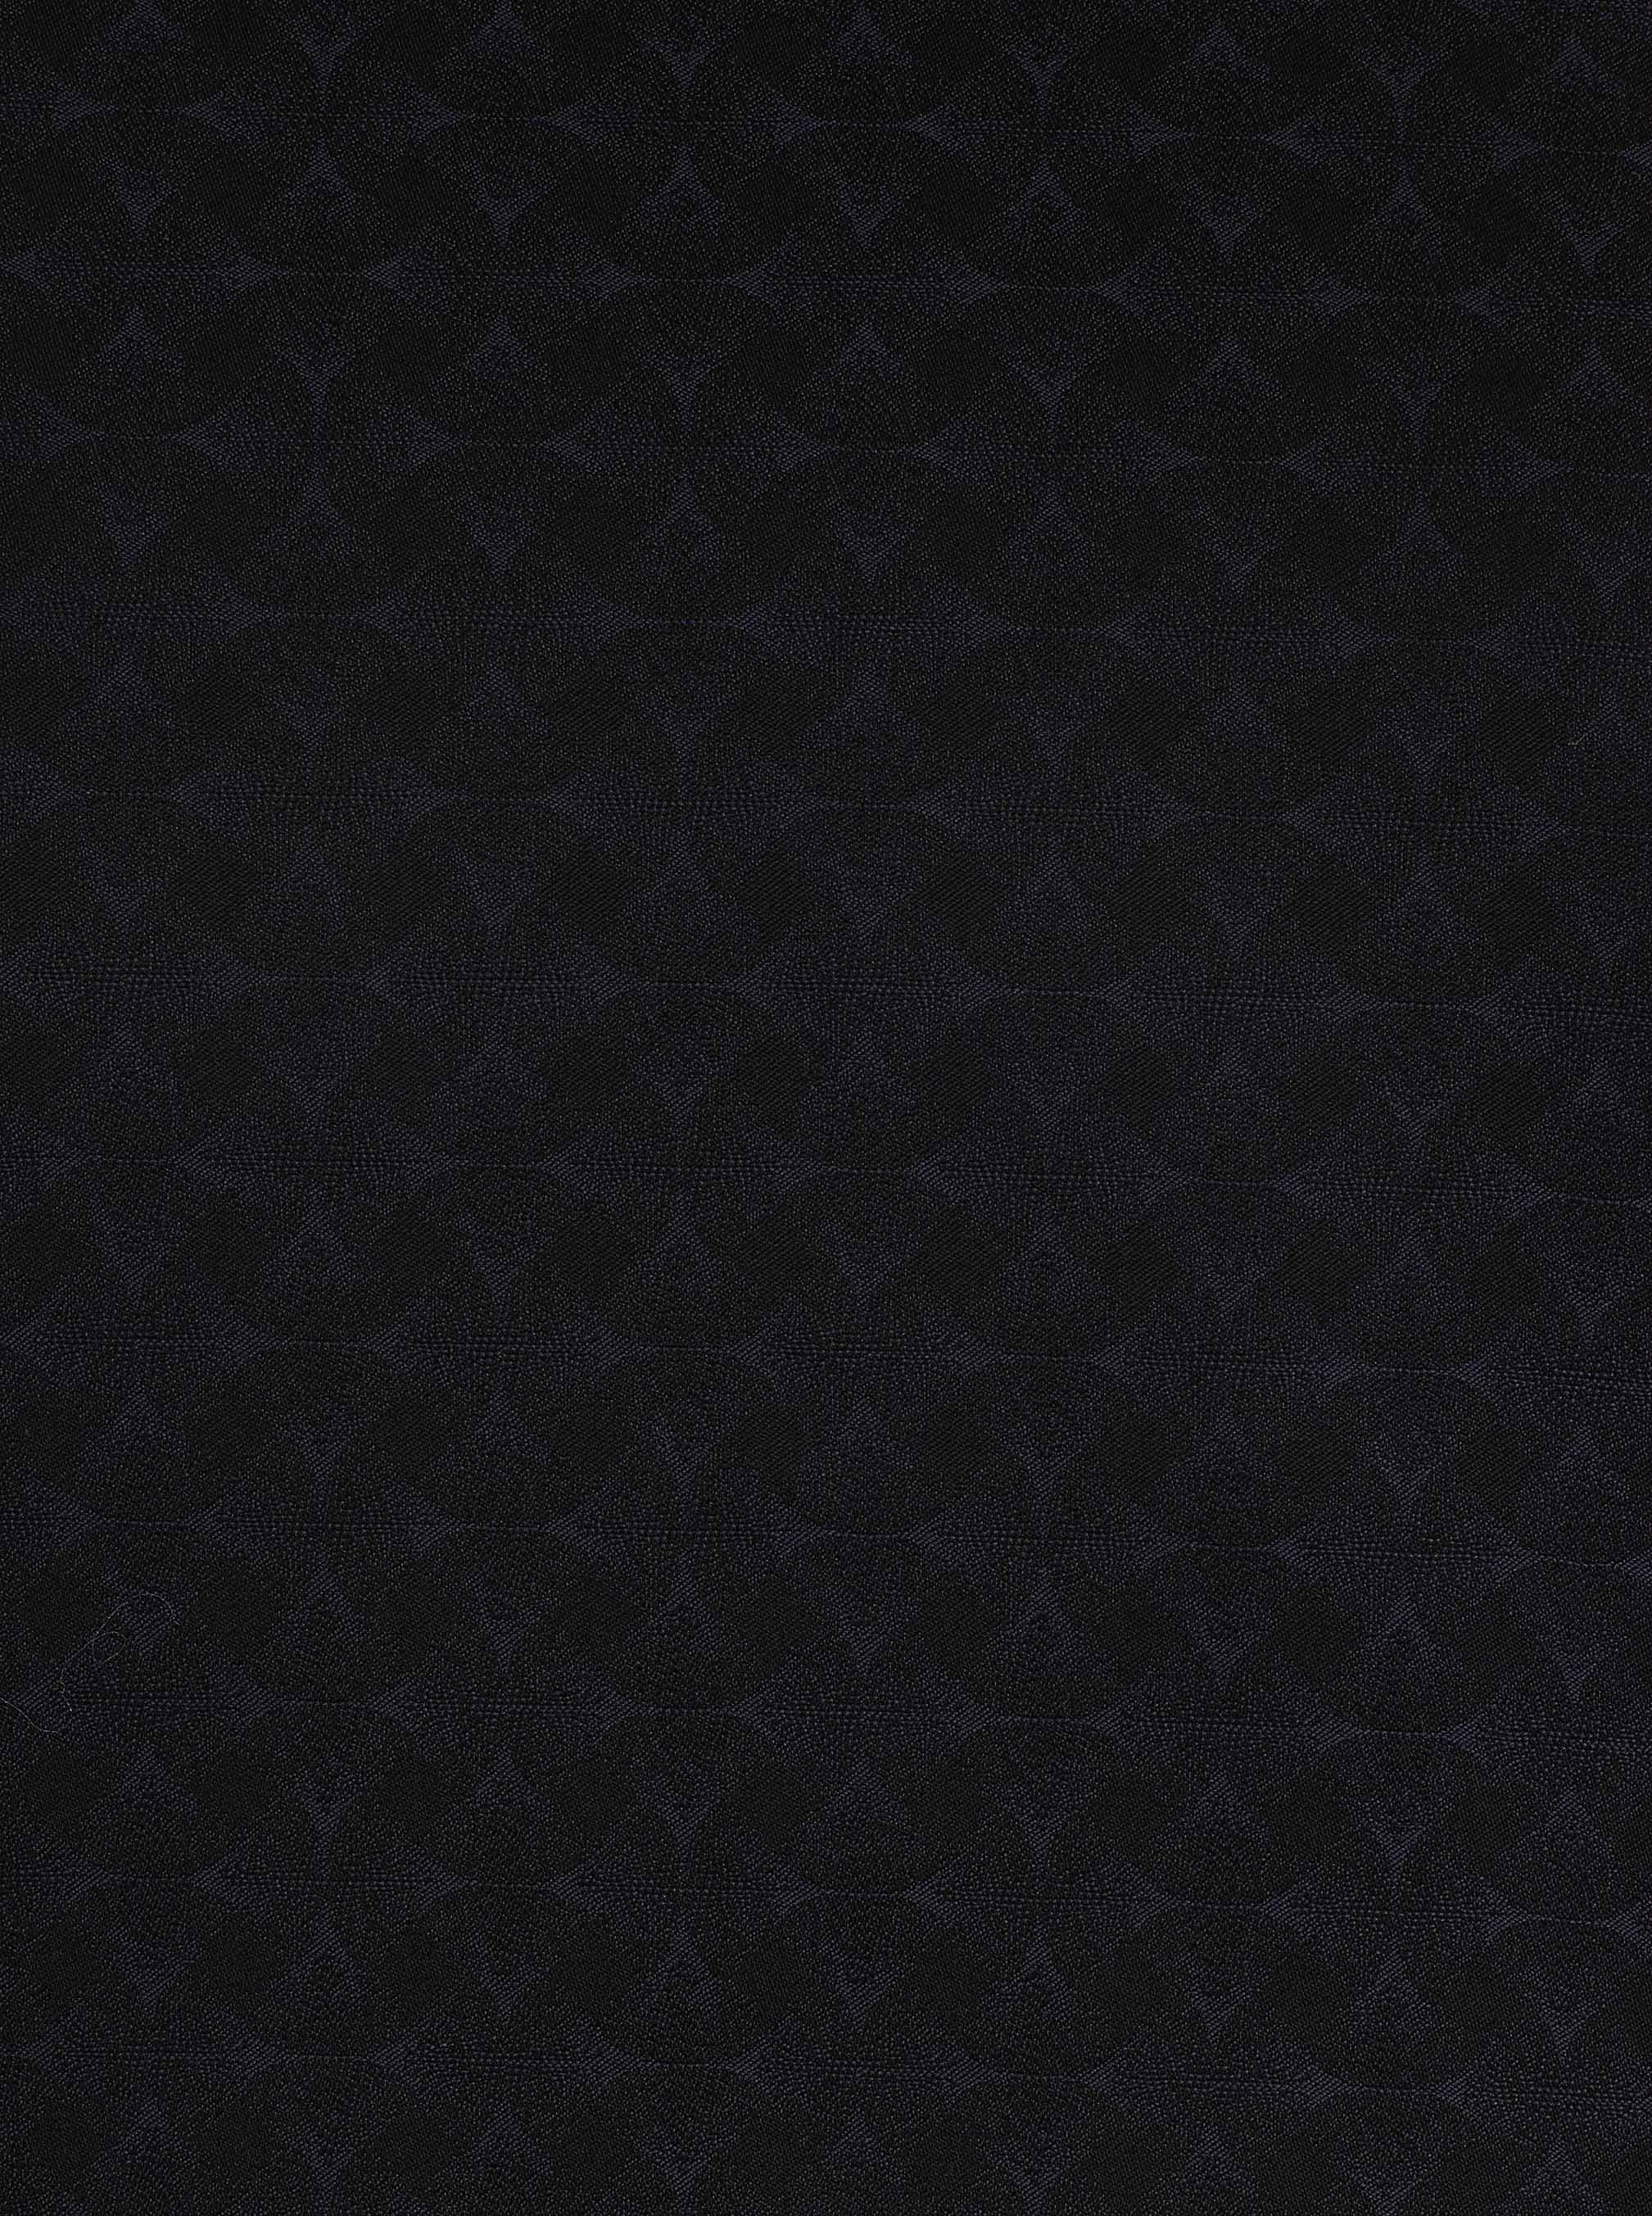 Regular Robert Clásica Para Corta Graham De Hombre Camisa Diamante Manga Ajustada vAFfUf